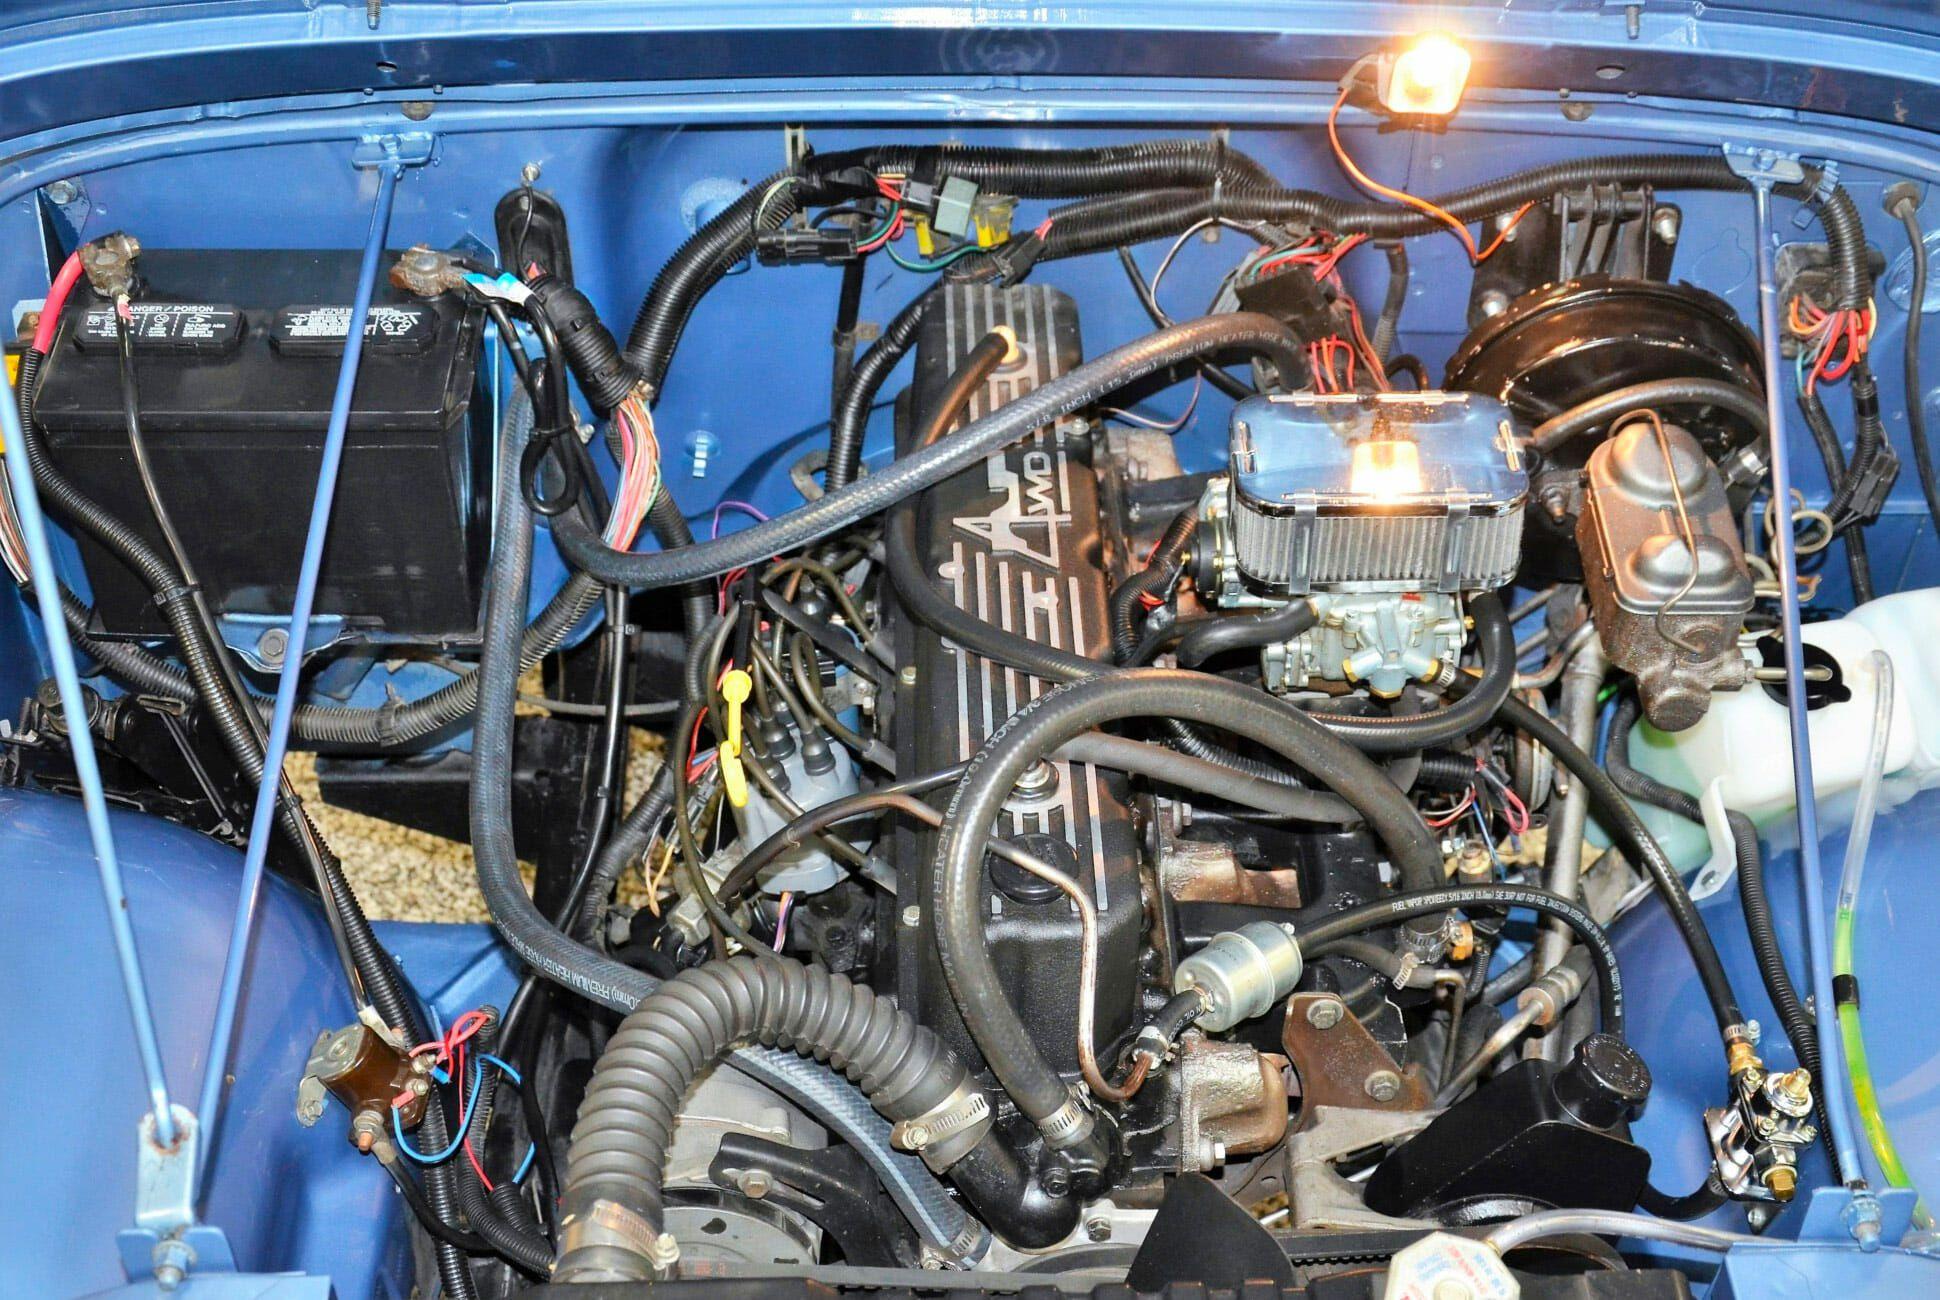 1984-Jeep-CJ8-Scrambler-gear-patrol-slide-9